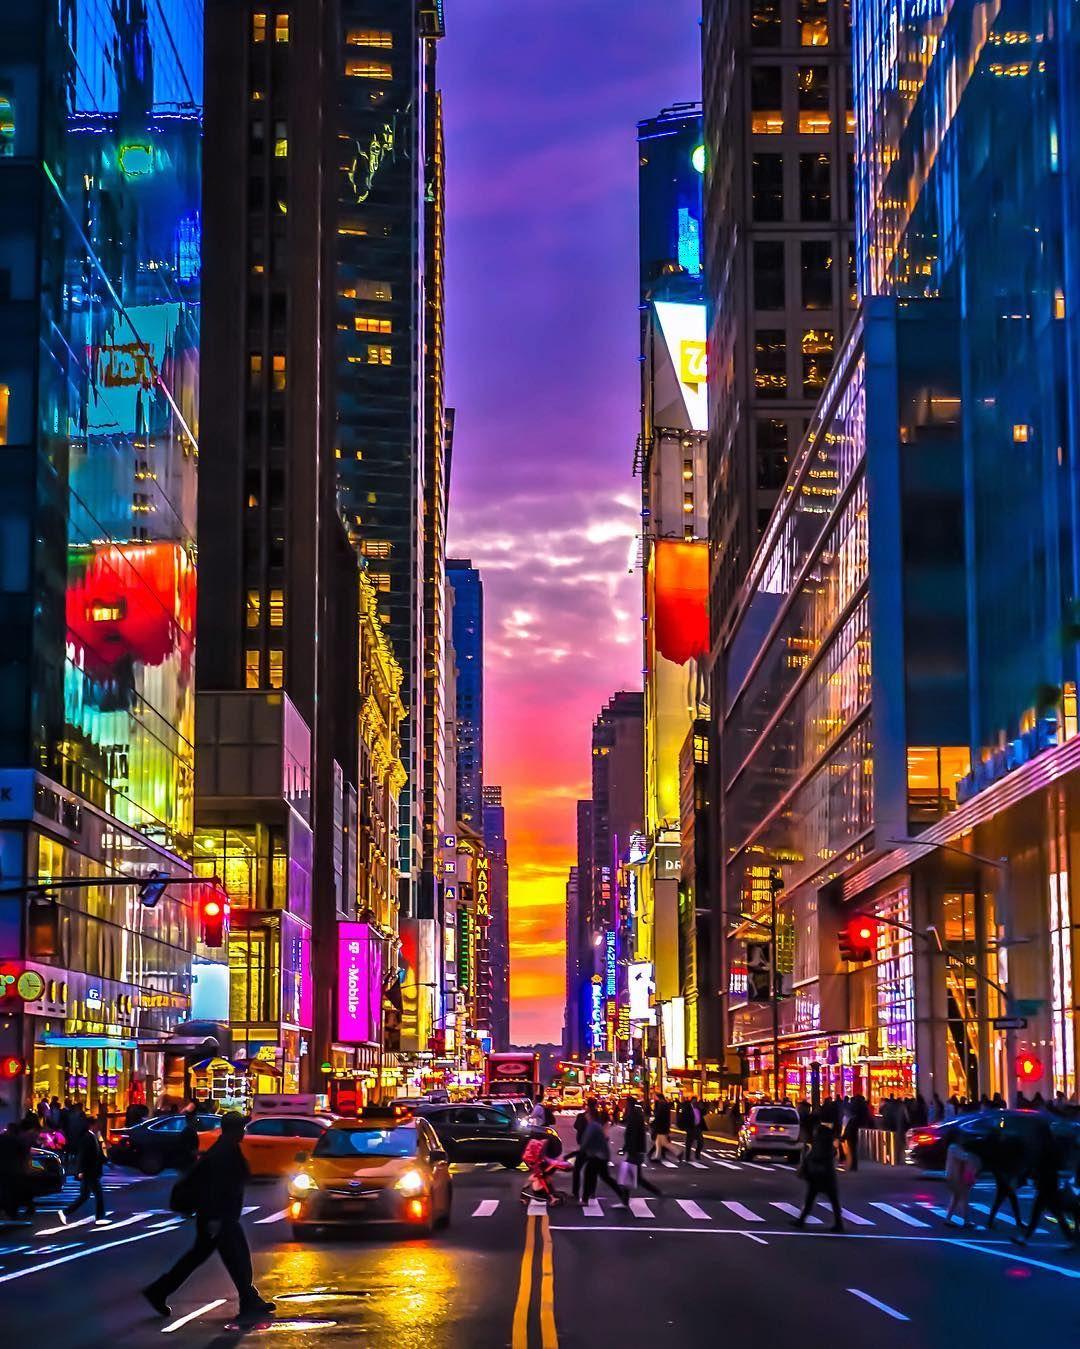 Admin Bnw Sundays Mod Night Sh00terz Nightshooters Profile By Kodak Visit New York City Nyc Times Square Visit New York